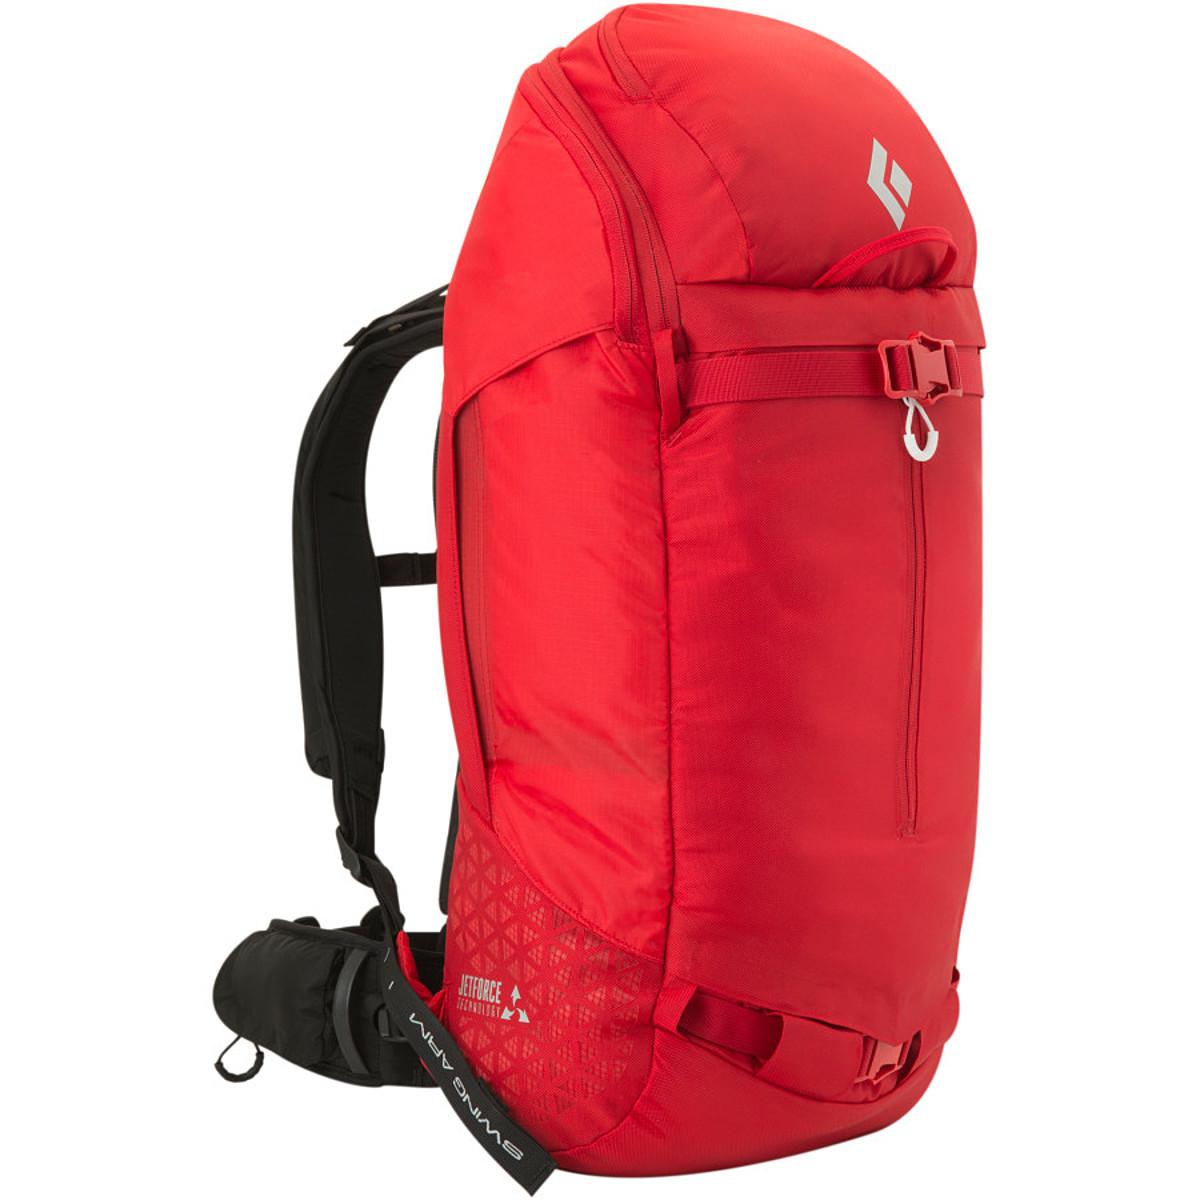 photo: Black Diamond Saga 40 Jetforce Avalanche Airbag Pack avalanche airbag pack